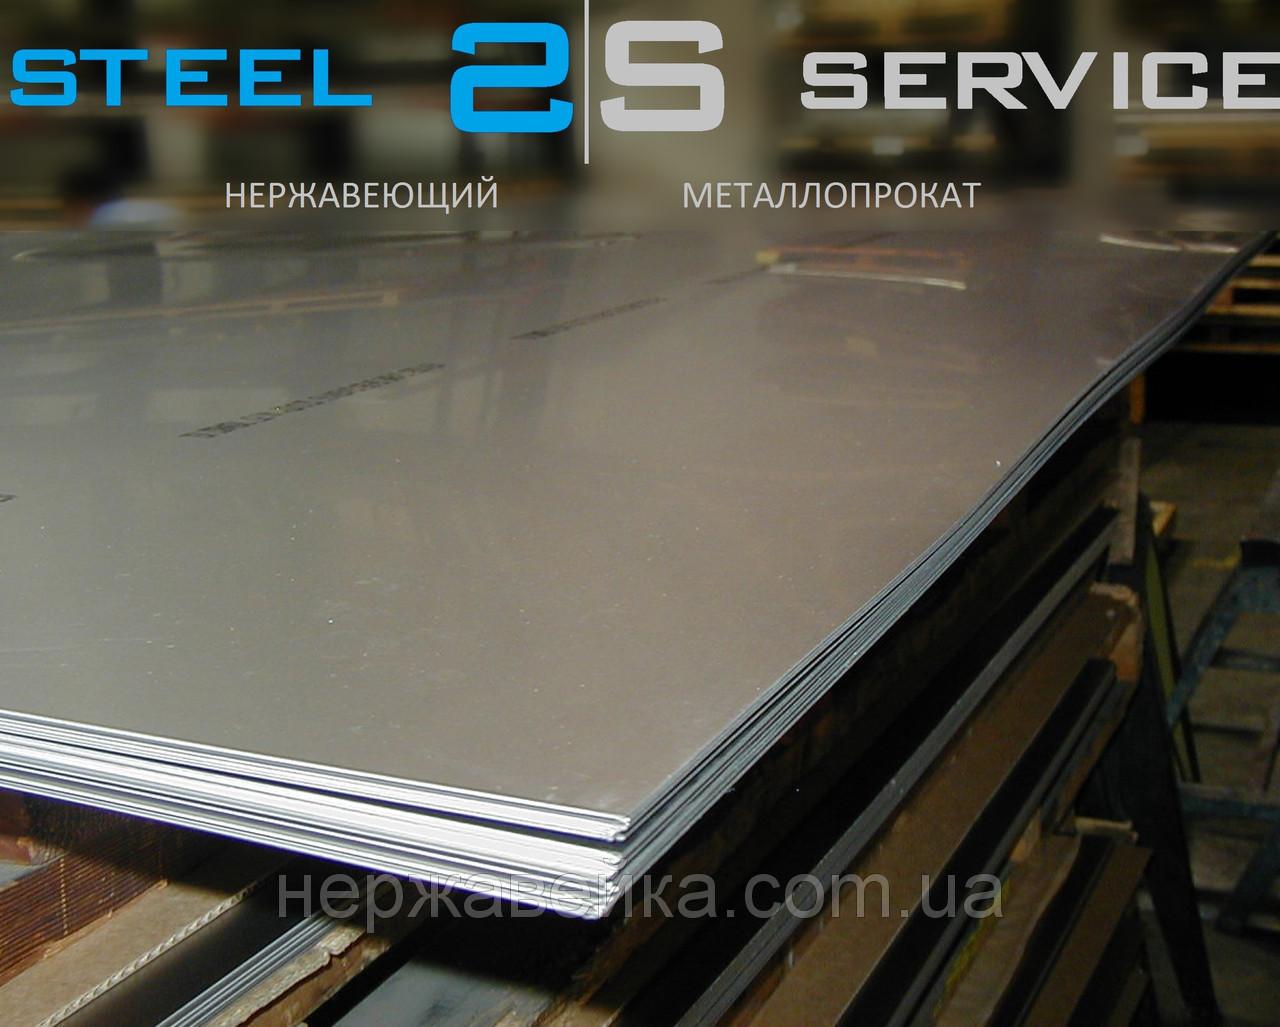 Нержавейка лист 20х1500х3000мм  AISI 316Ti(10Х17Н13М2Т) F1 - горячекатанный,  кислотостойкий